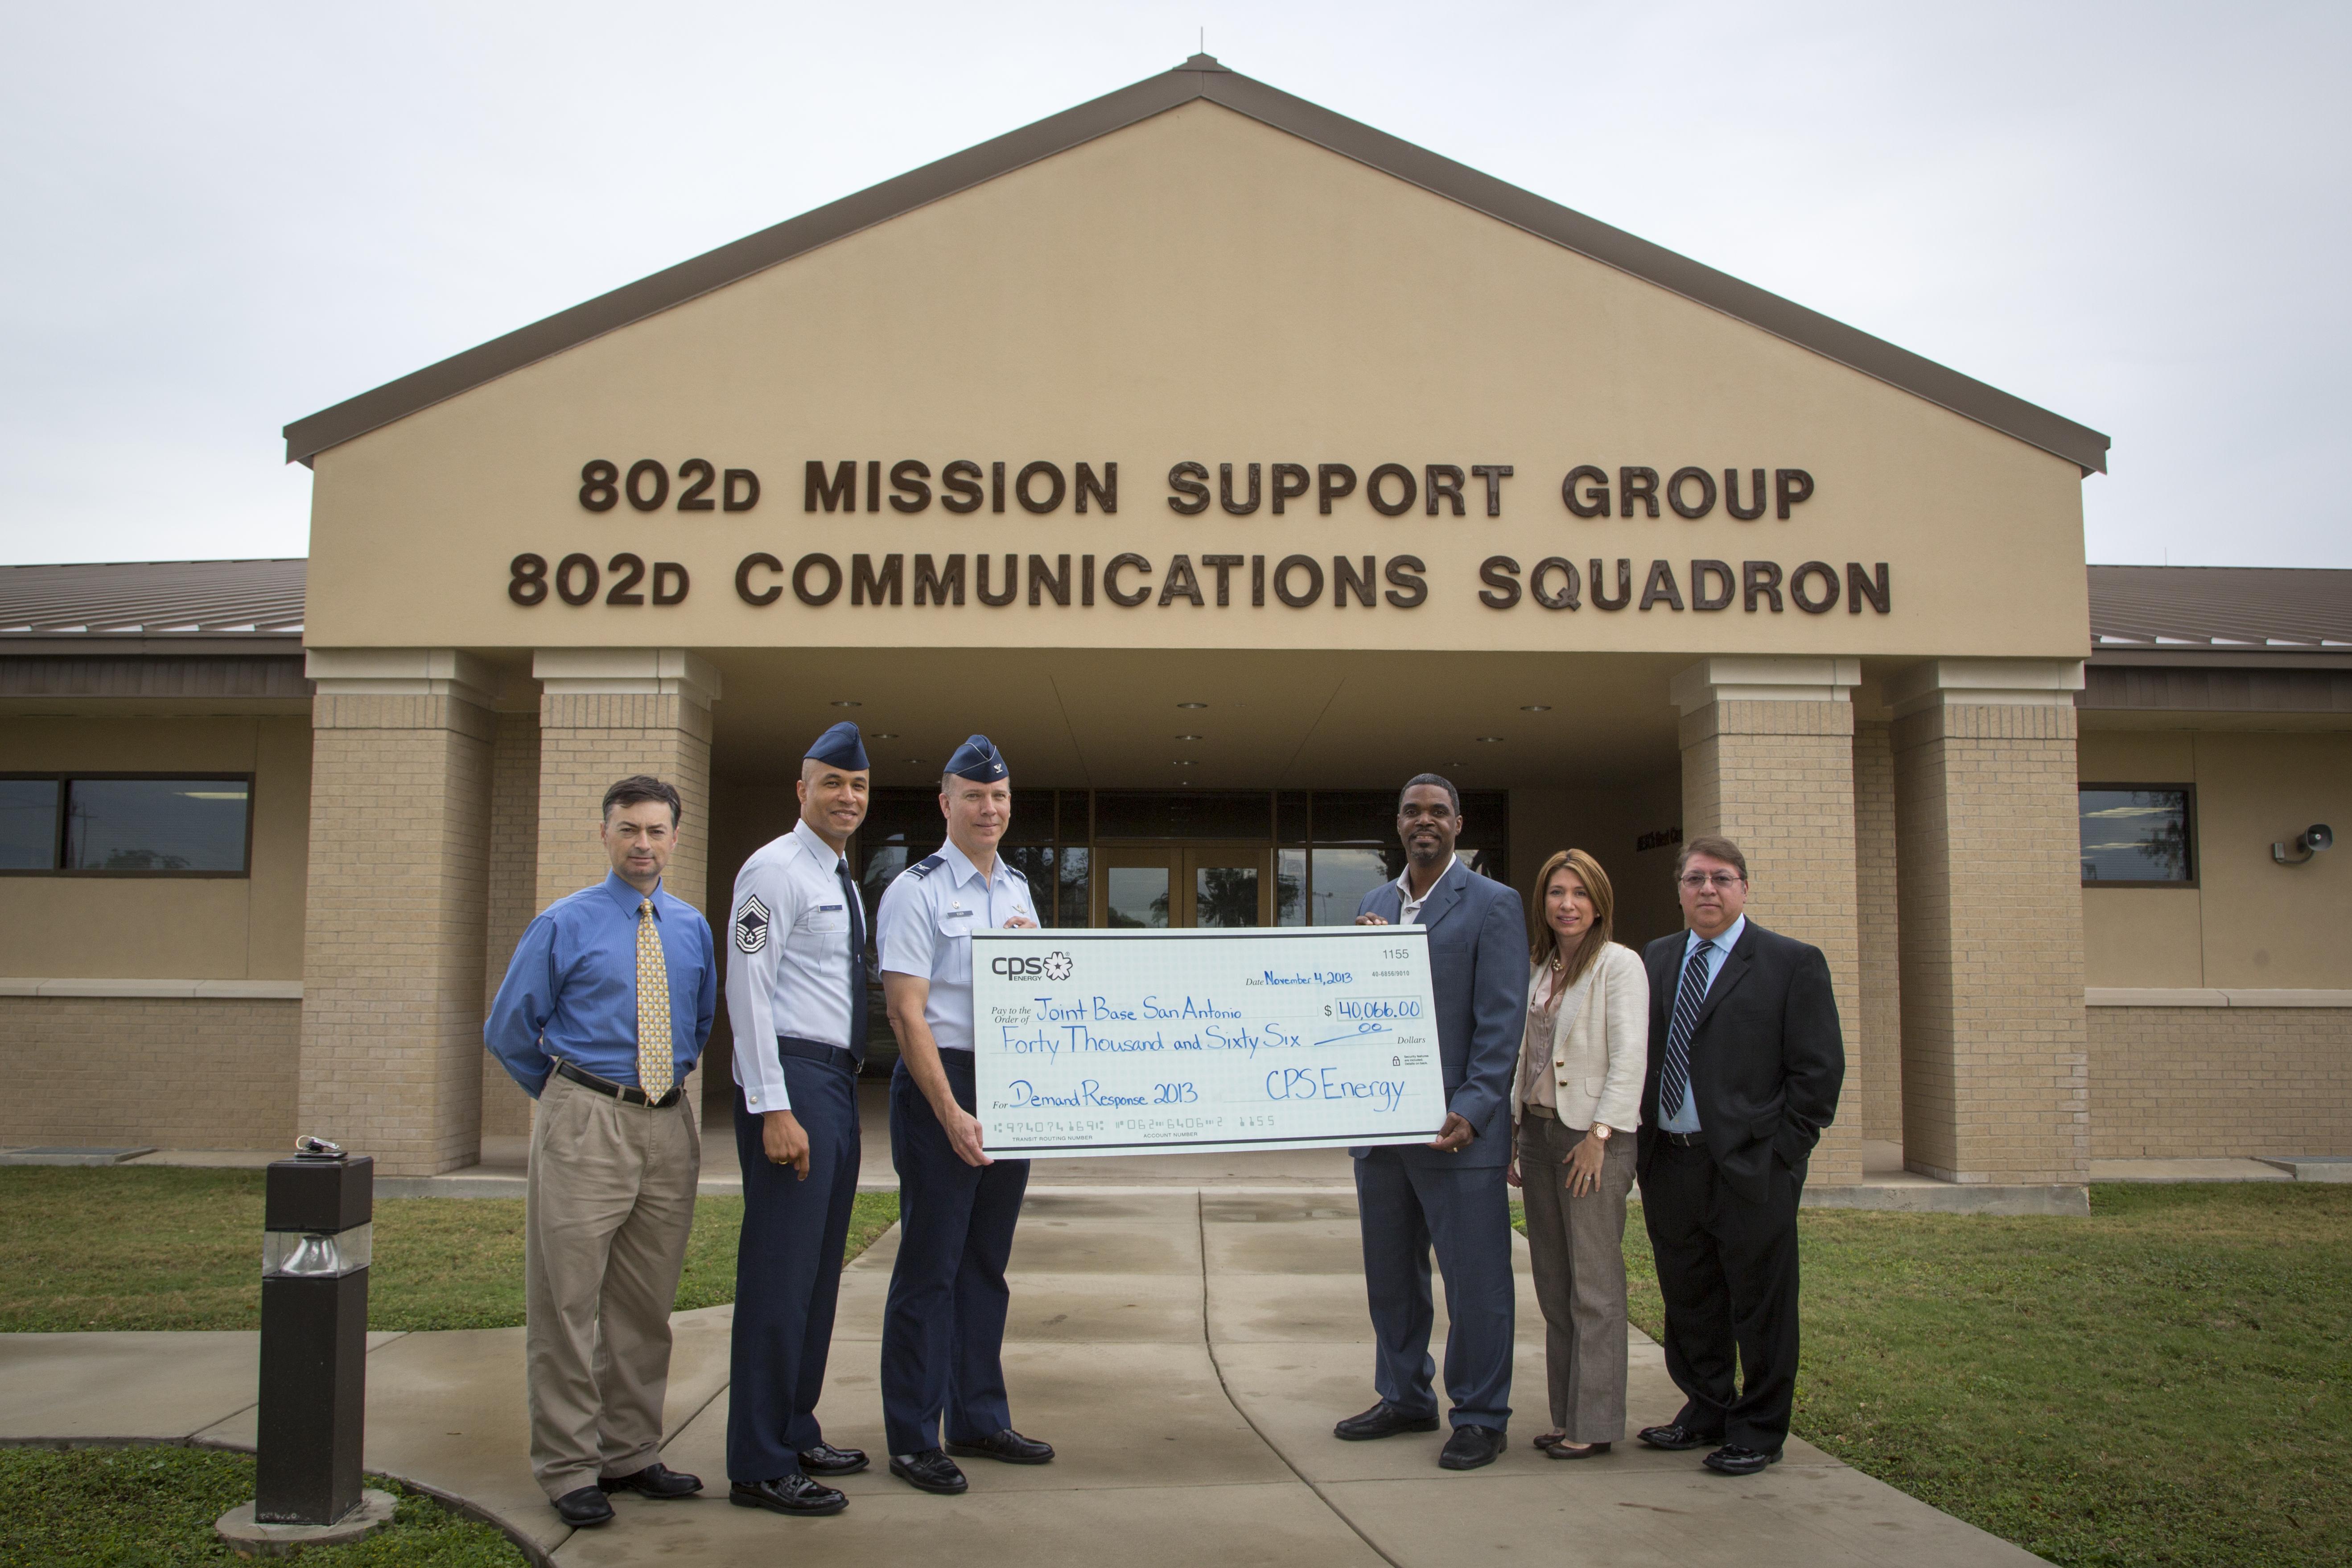 Jbsa Receives Rebate From Cps Energy Joint Base San Antonio News